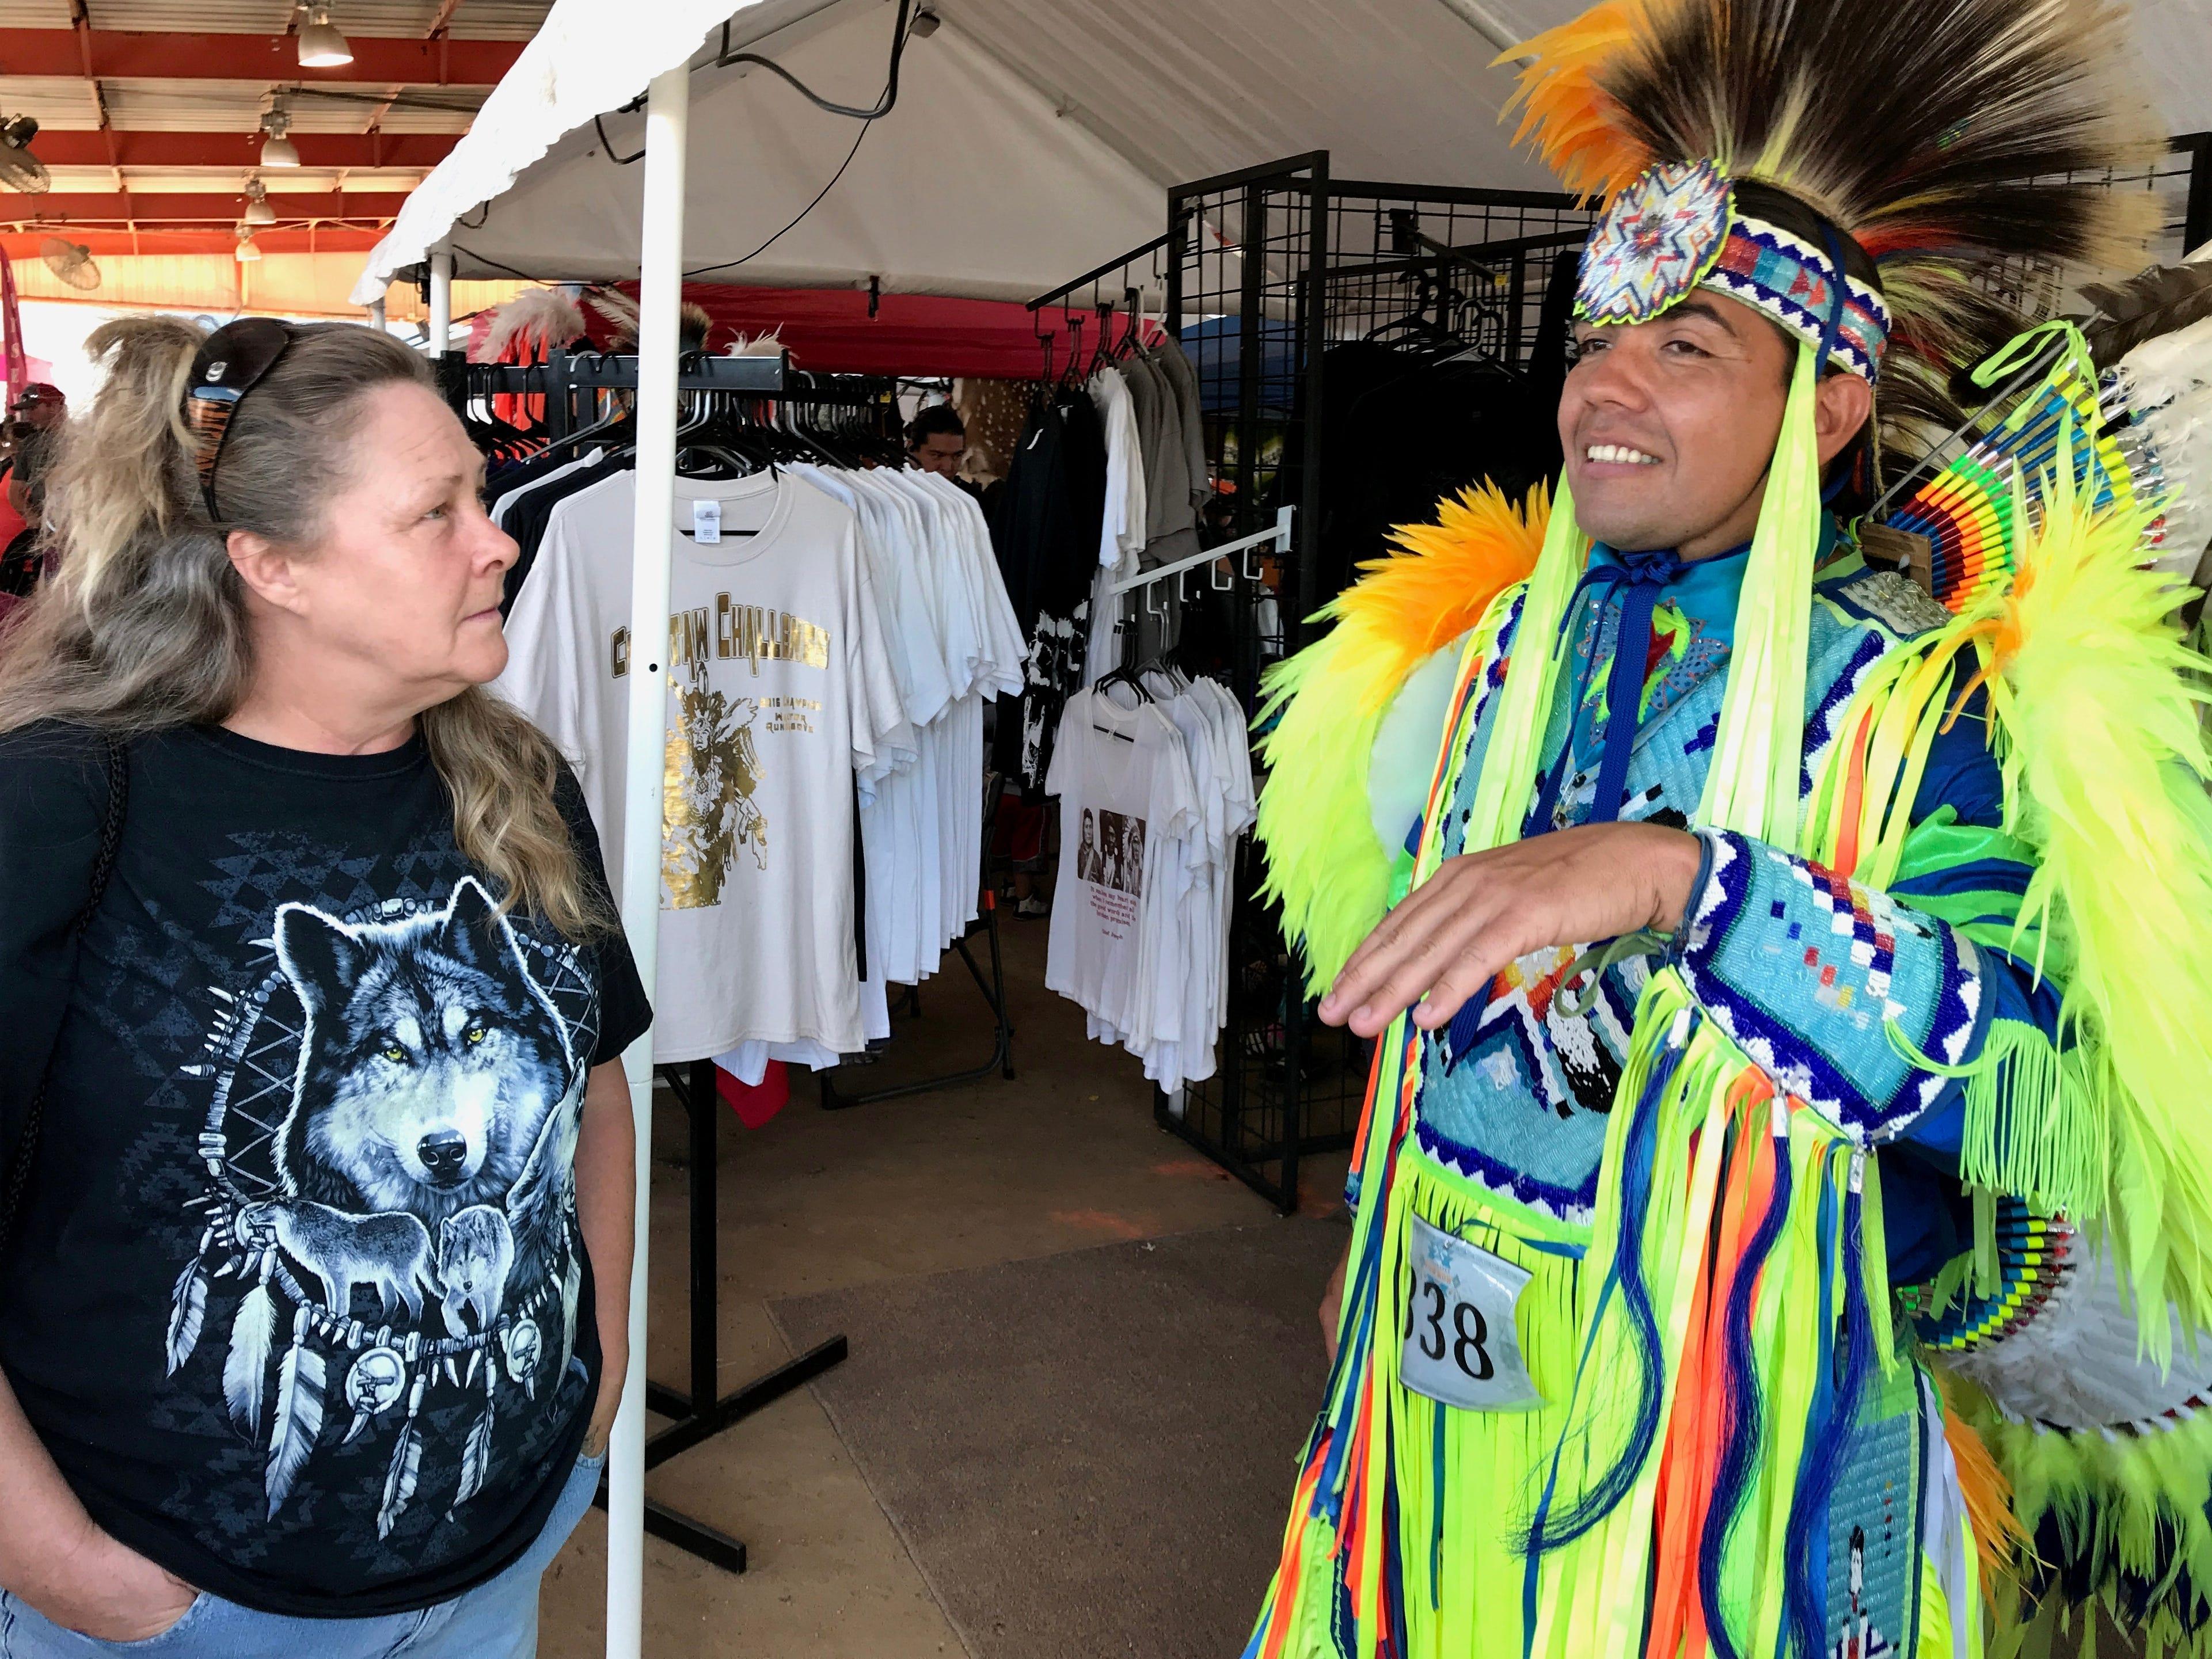 Lisa Davis of Anderson, left, talks with Winnemem-Wintu dancer Douglas Scholfield of Redding on Saturday at the 2018 Stillwater Powwow in Anderson.